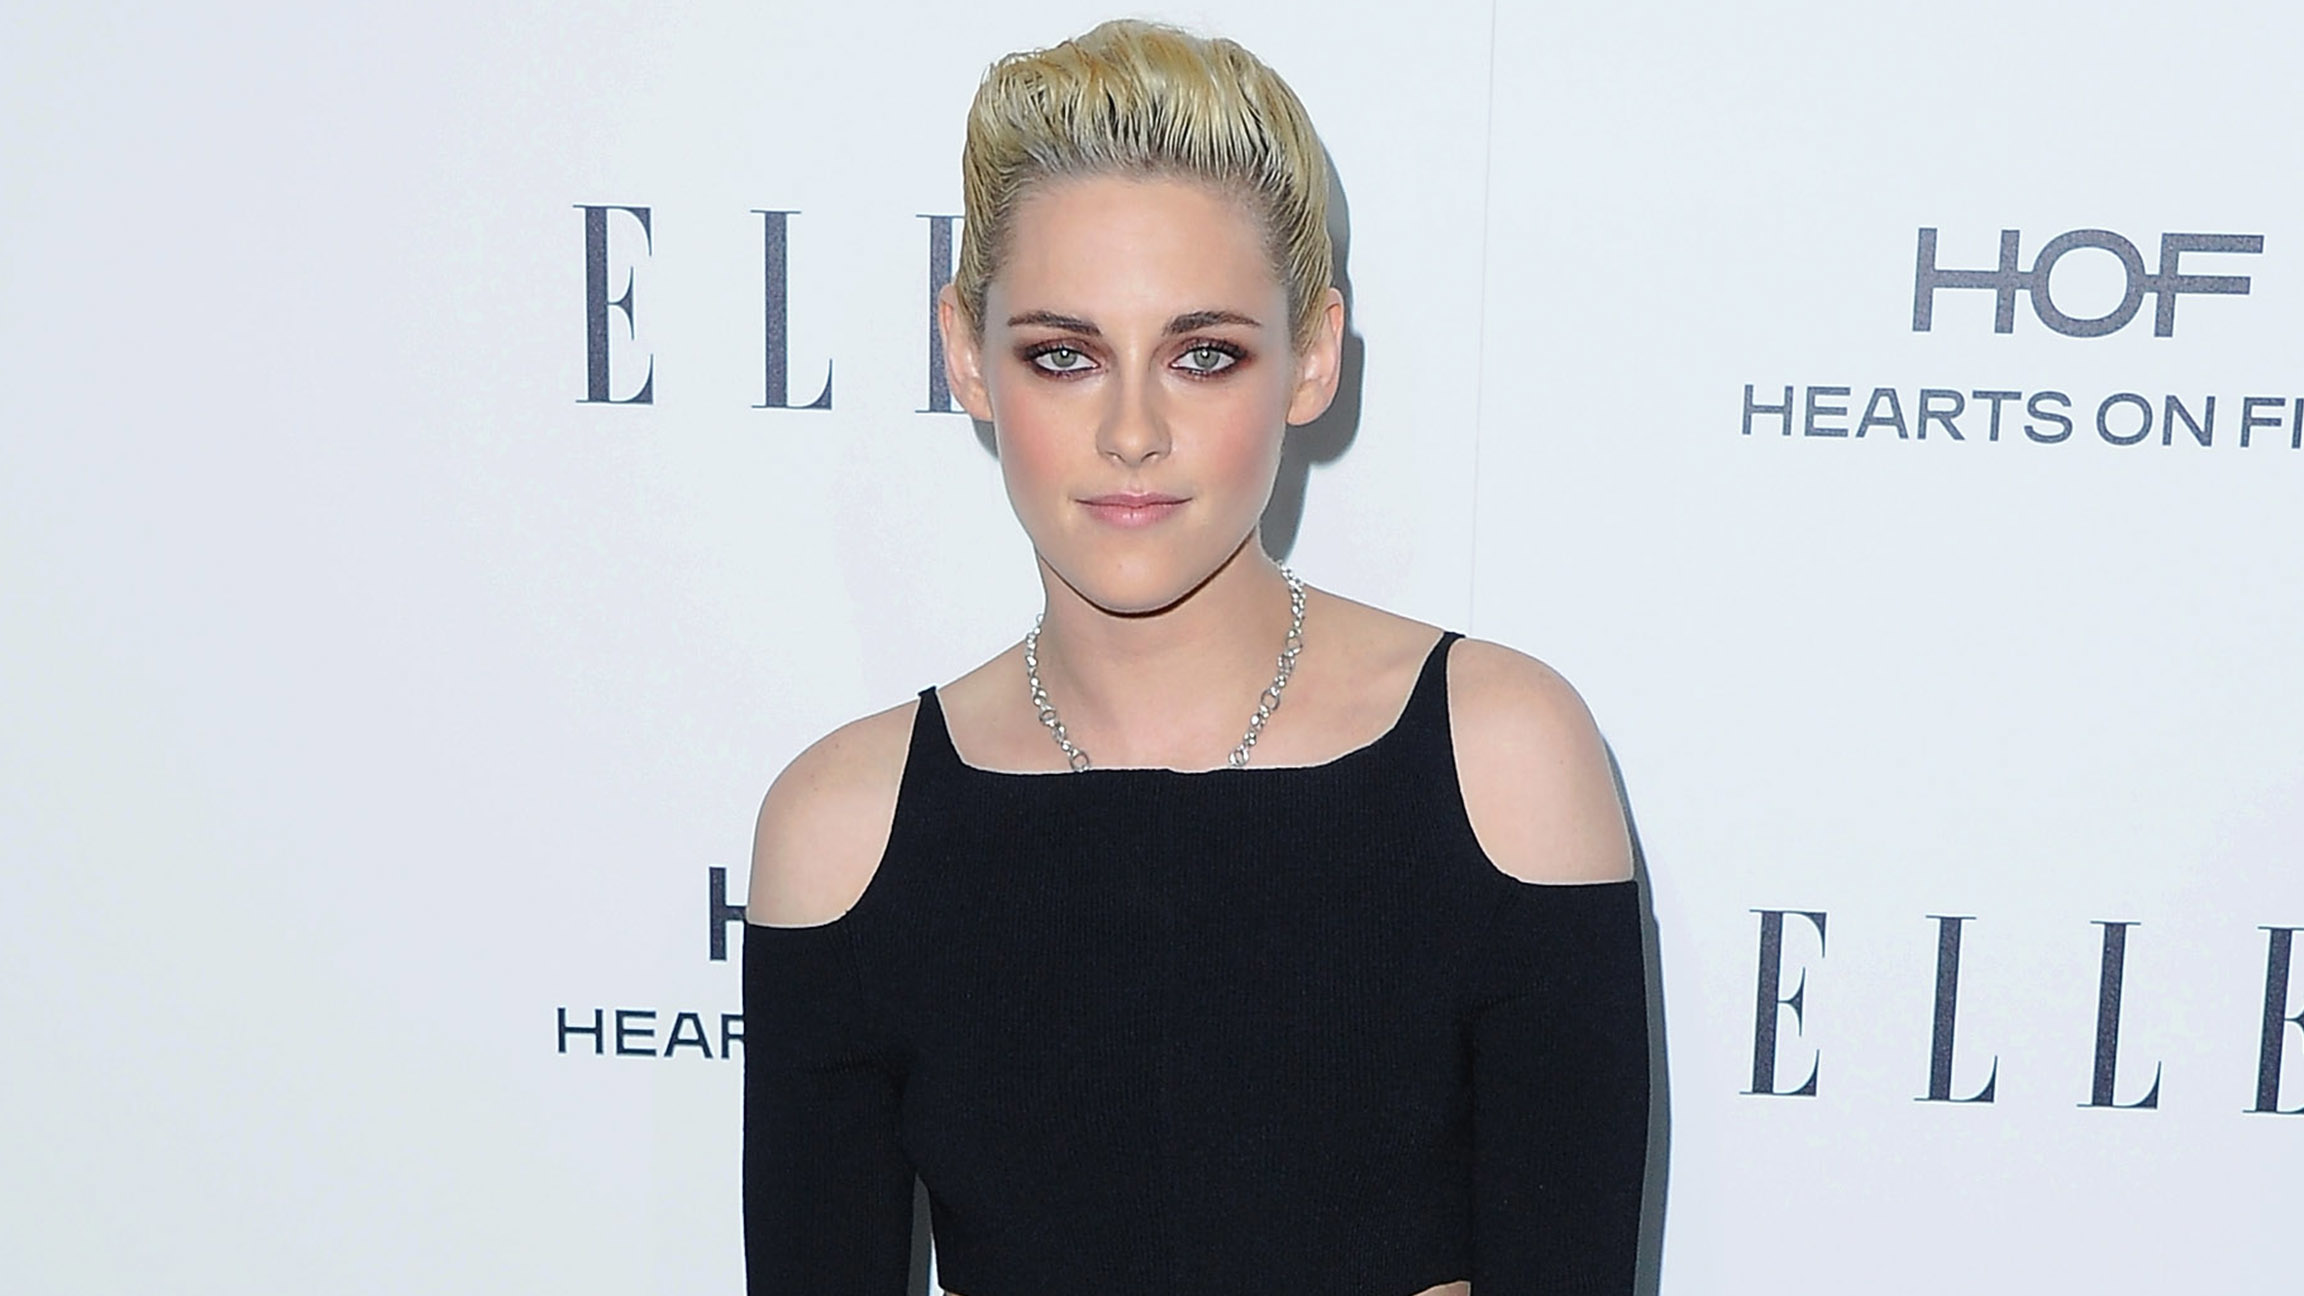 Happiest season, Kristen Stewart è la protagonista del film commedia di Natale 2020 a tema LGBTQ+